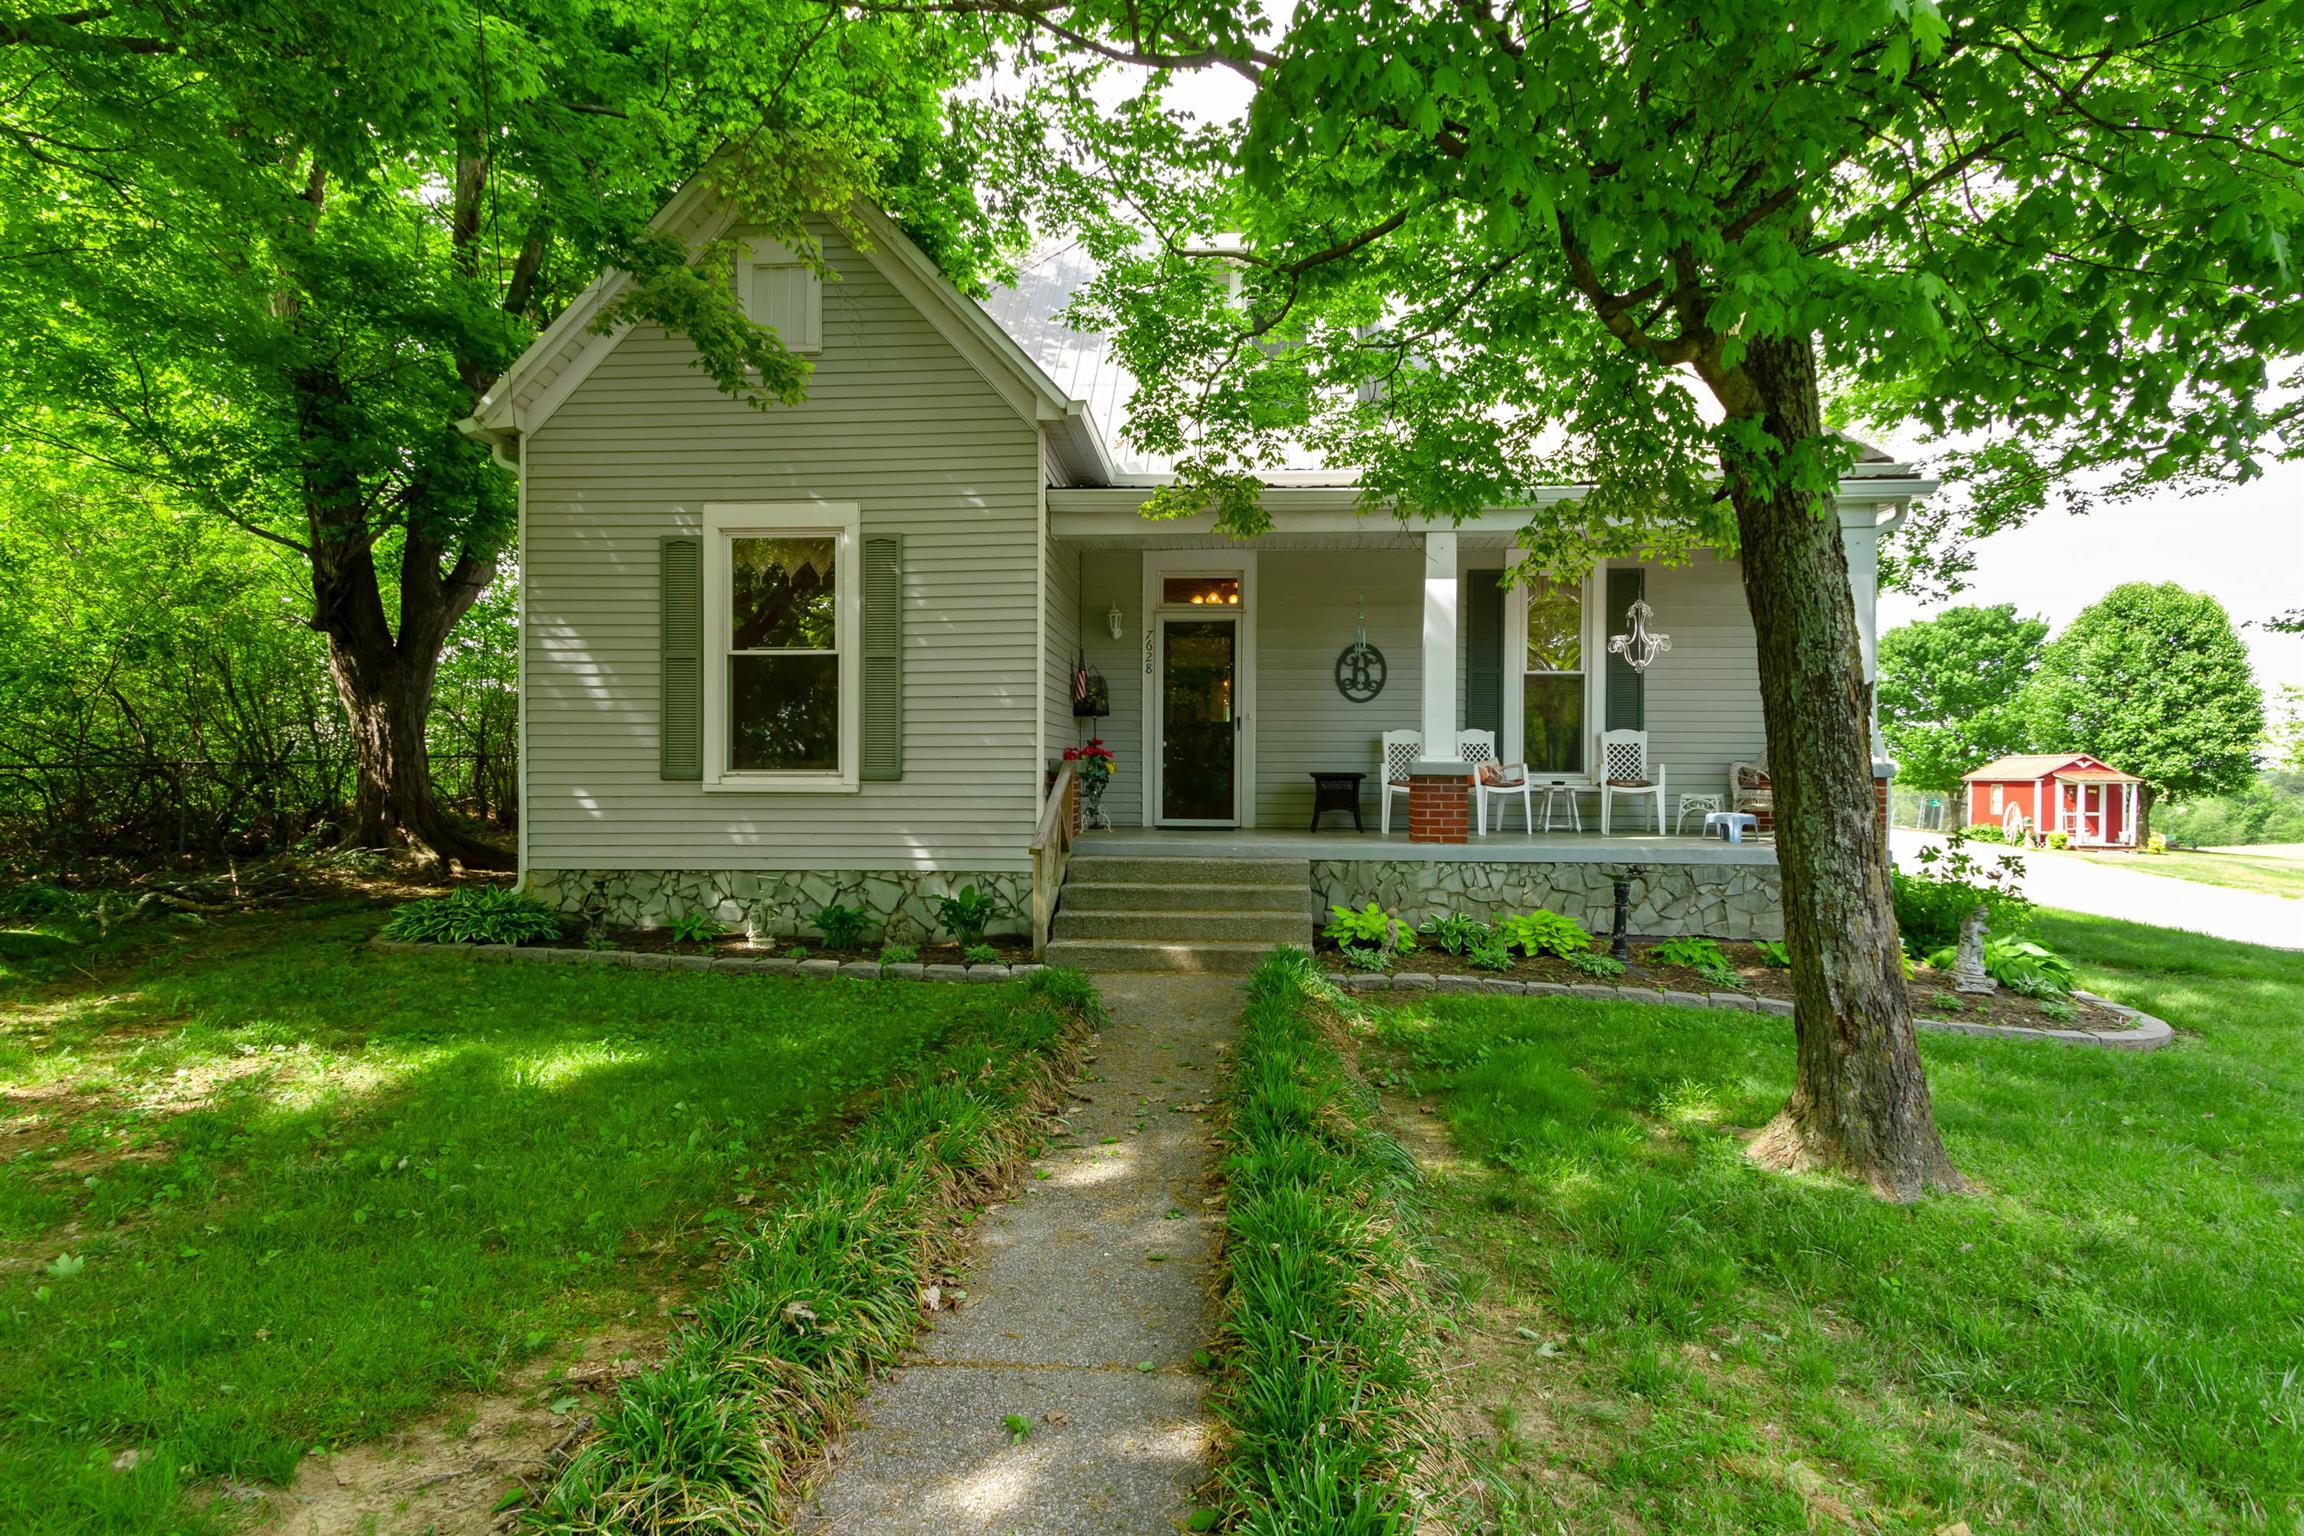 7628 Highway 25E, Cross Plains, TN 37049 - Cross Plains, TN real estate listing